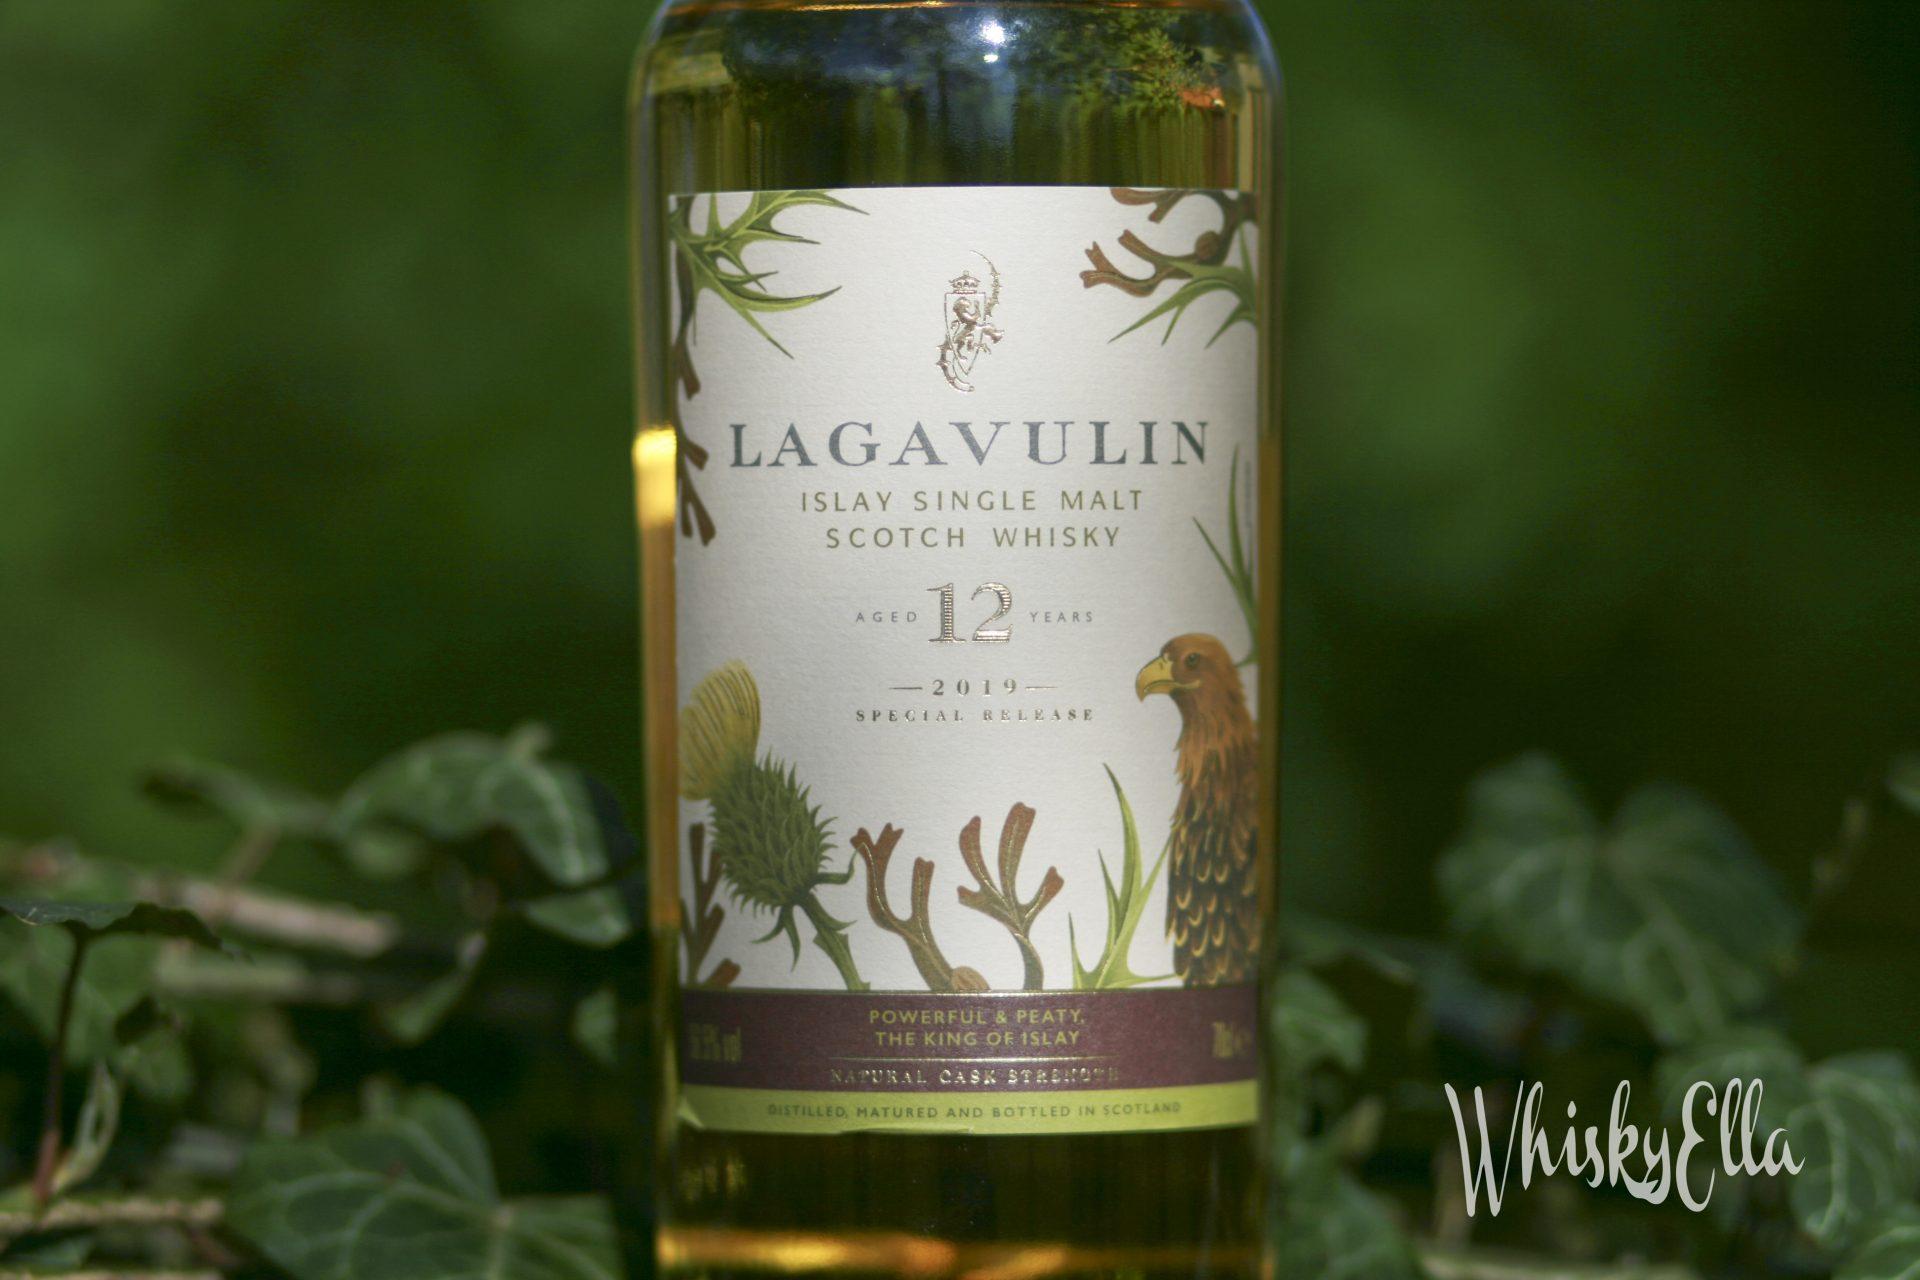 Nasza recenzja Lagavulin 12 yo Cask Strength 2019 #65